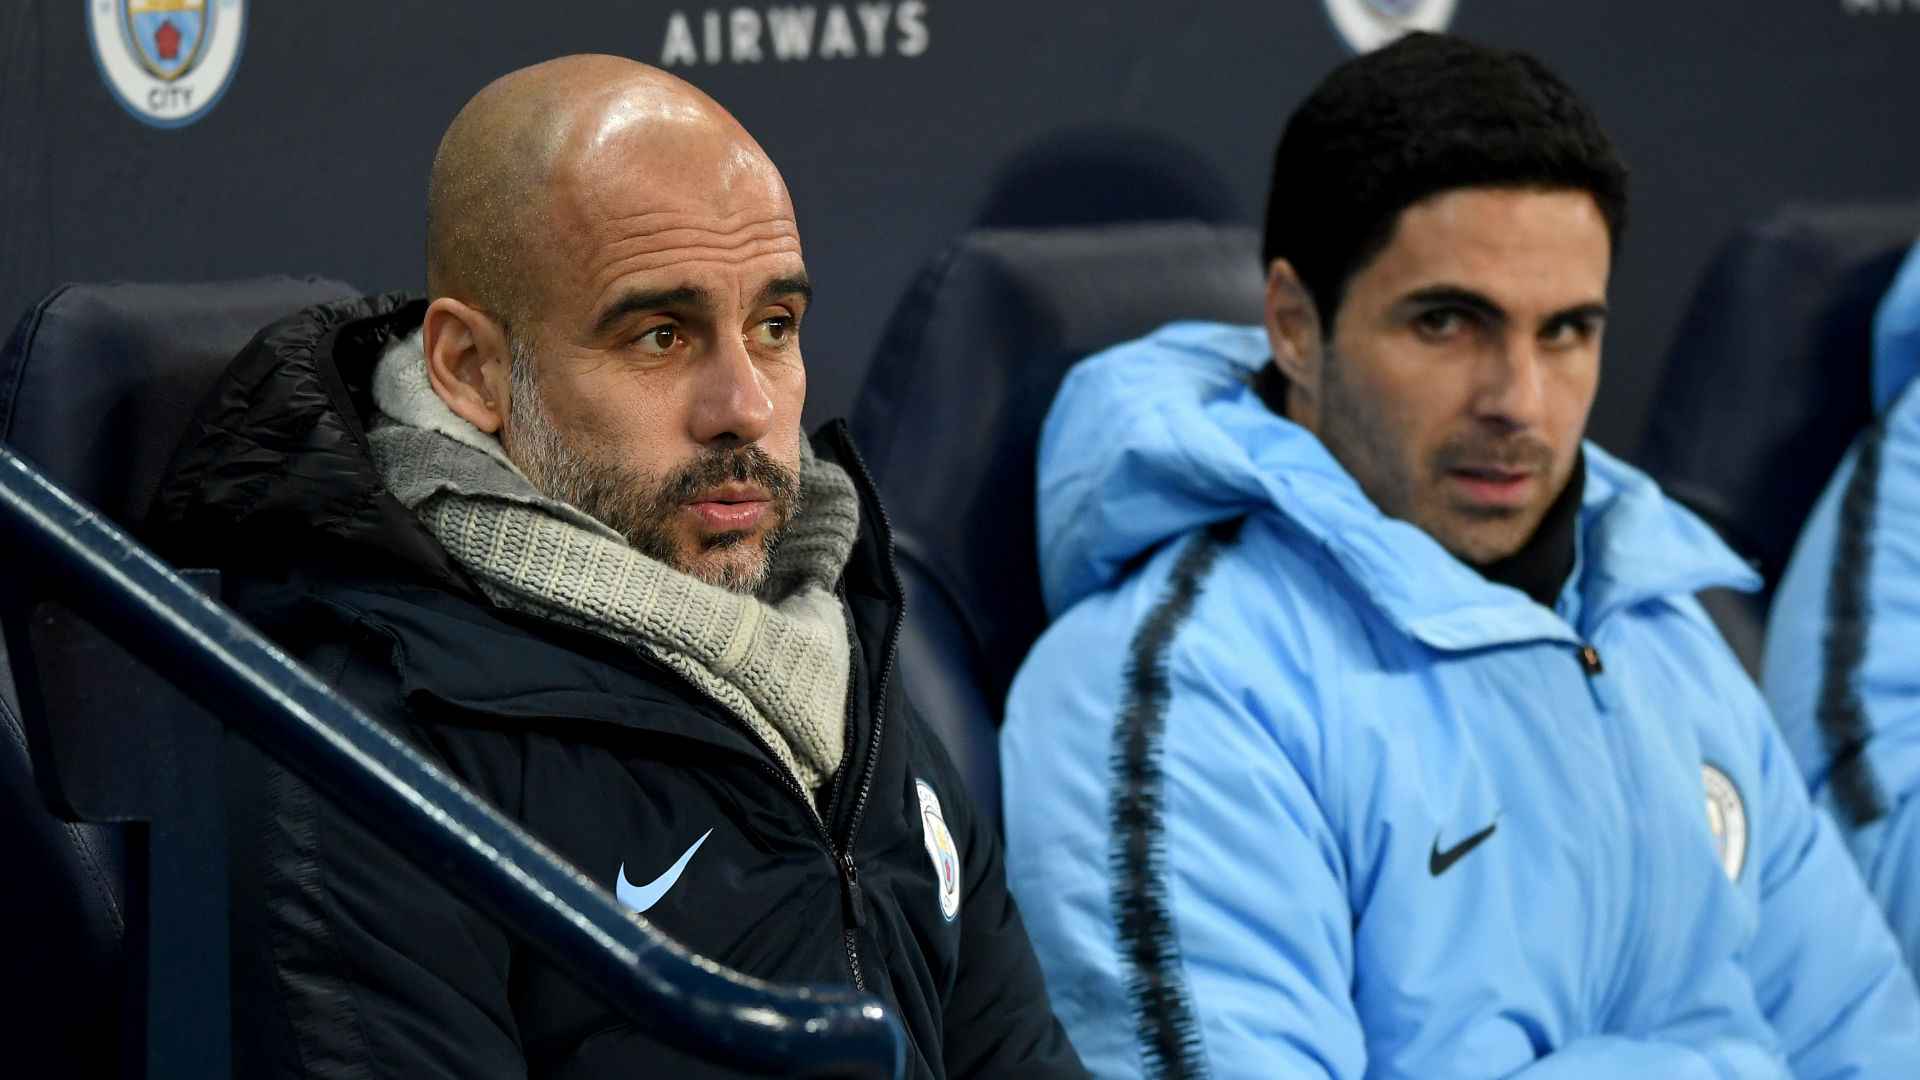 Guardiola doesn't want 'important' Arteta to feel 'uncomfortable' at Man City | Goal.com